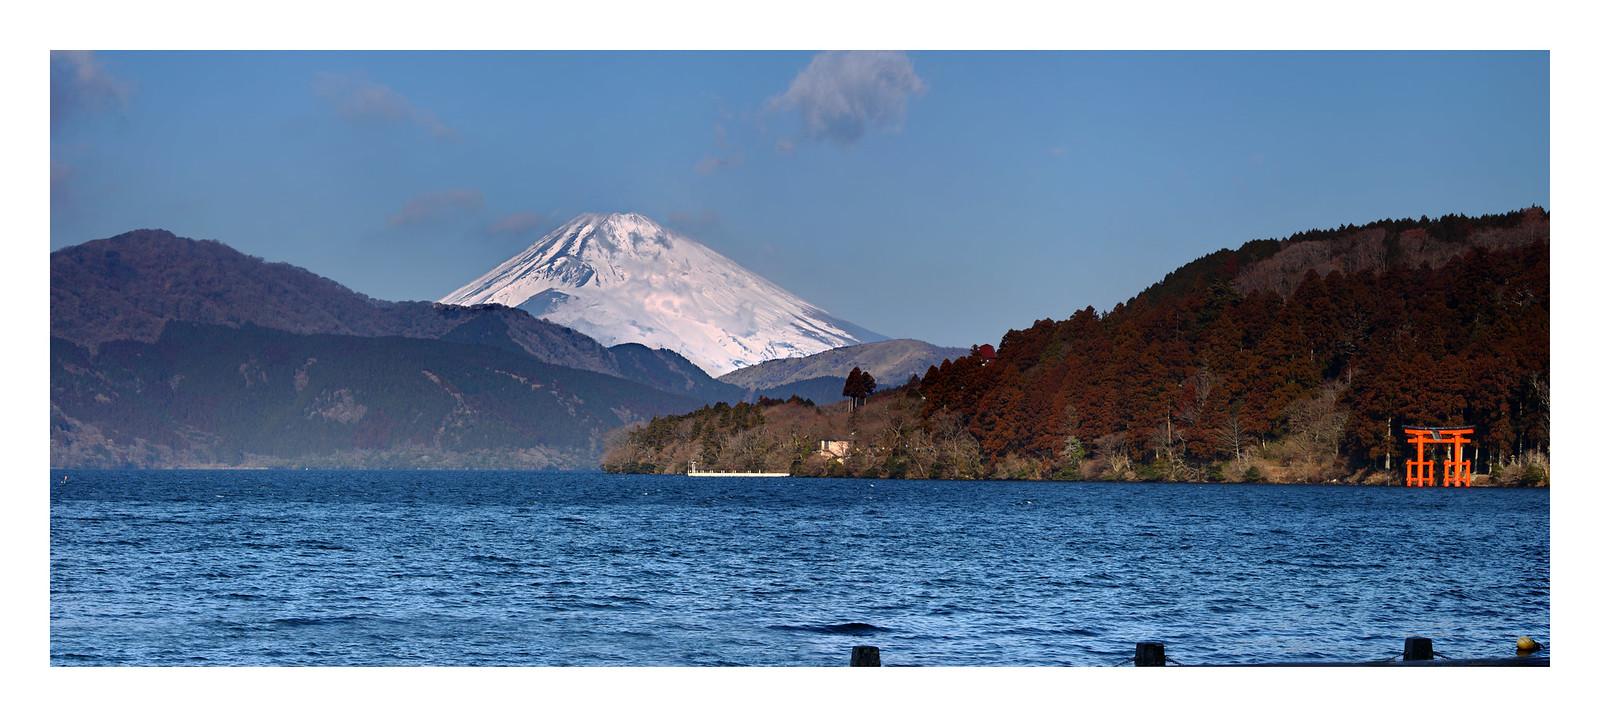 Lake Ashi Fuji-san